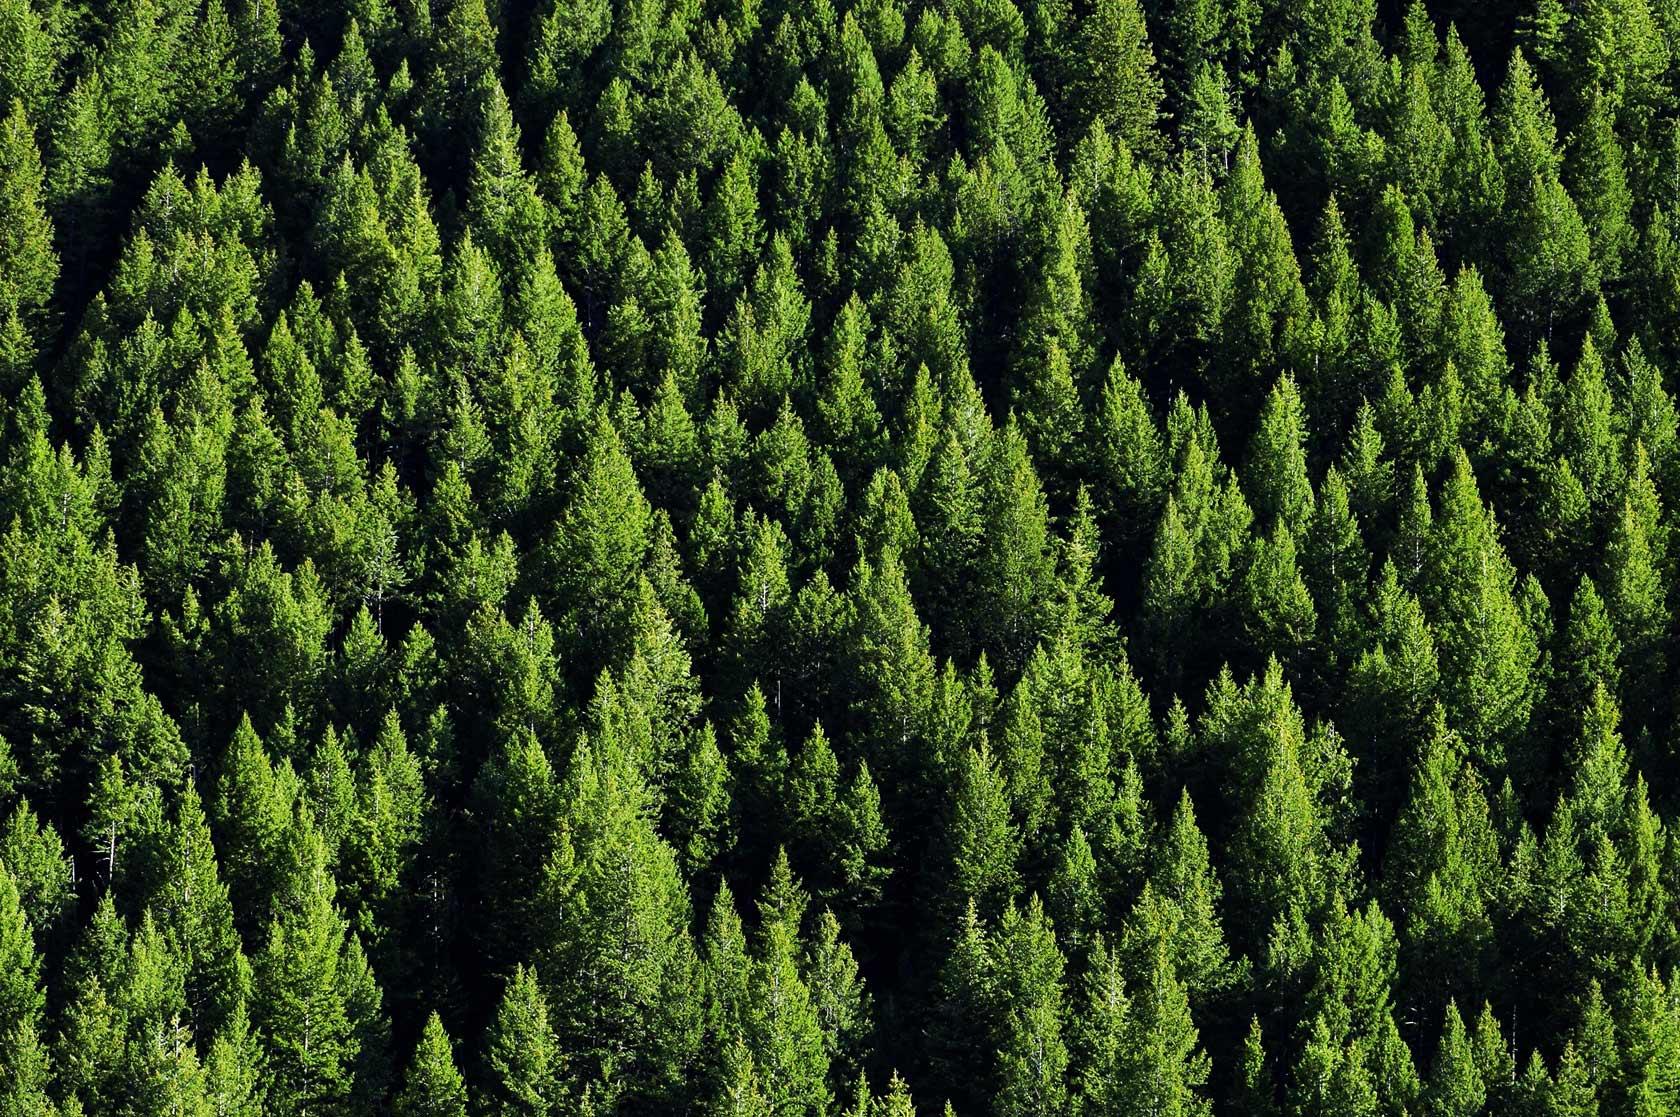 Opposti fondamentalismi ambientali